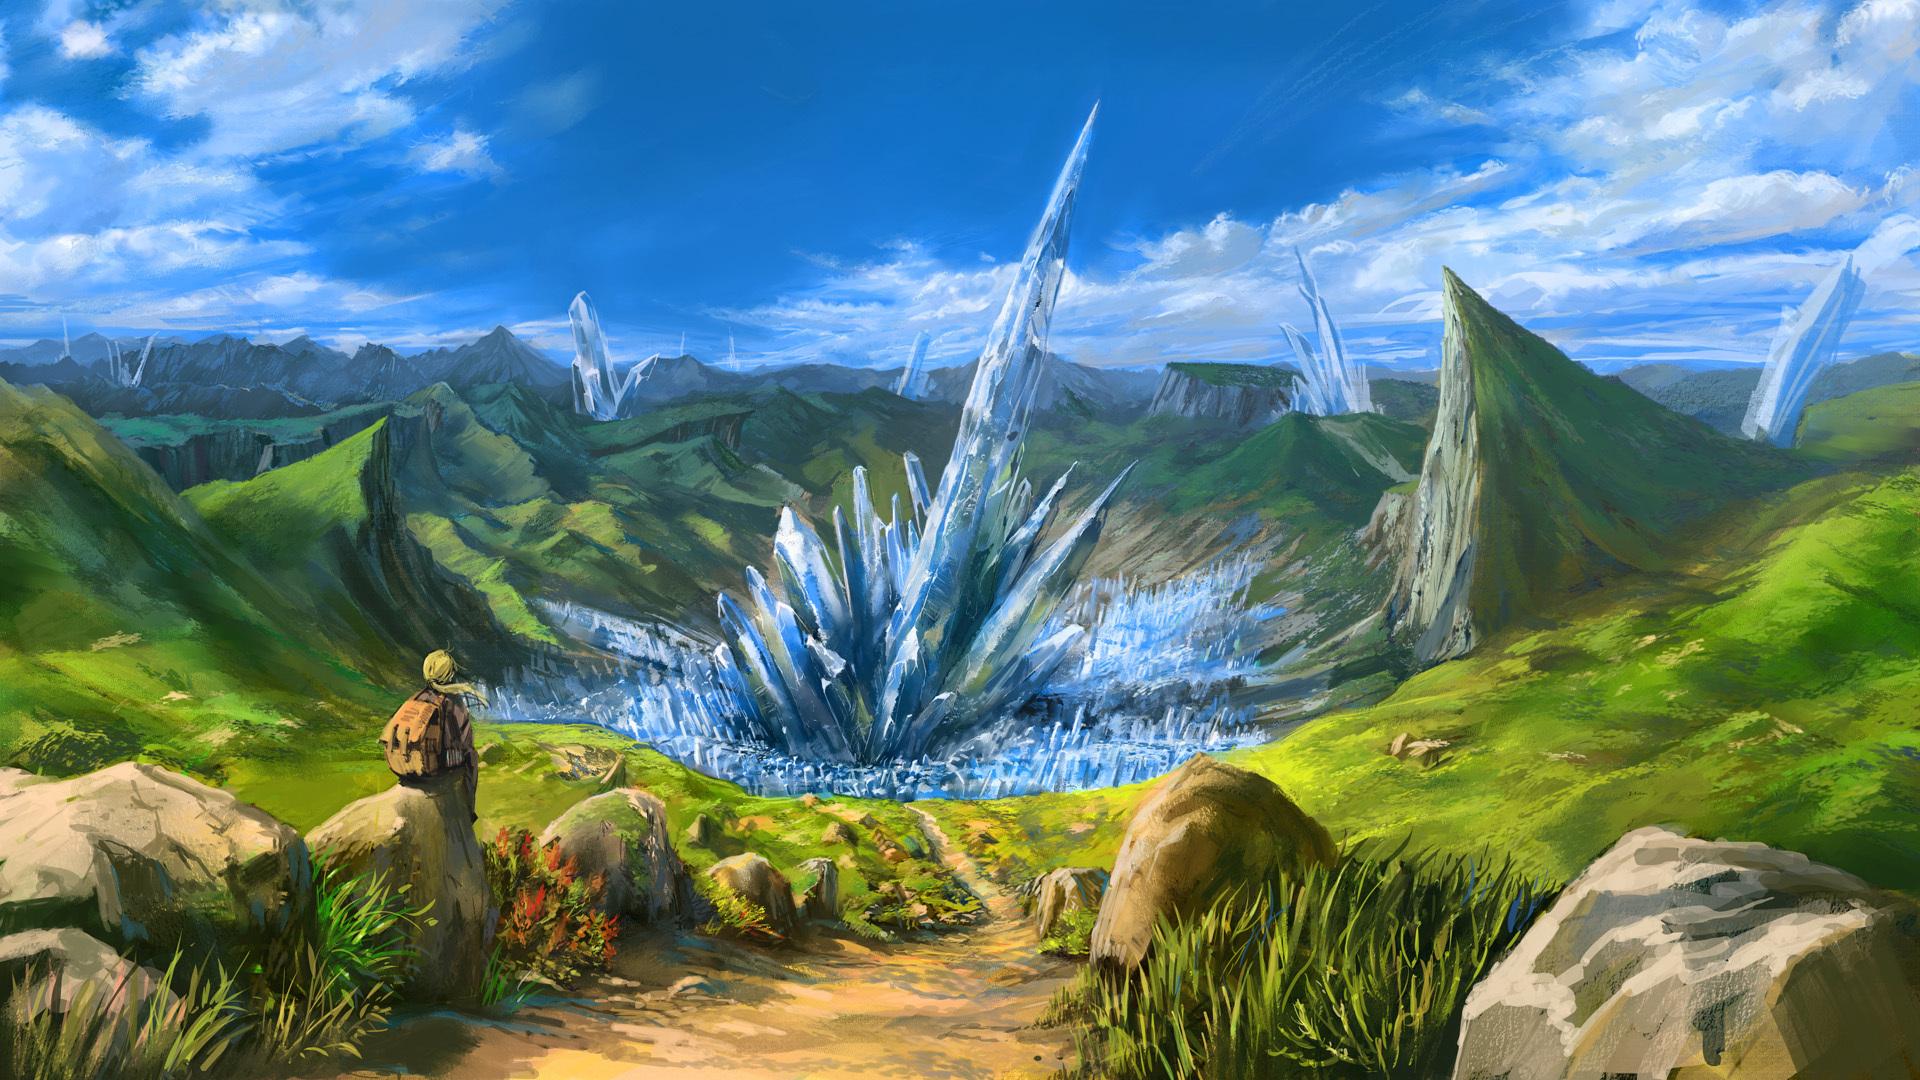 landscape hd wallpaper | background image | 1920x1080 | id:439042